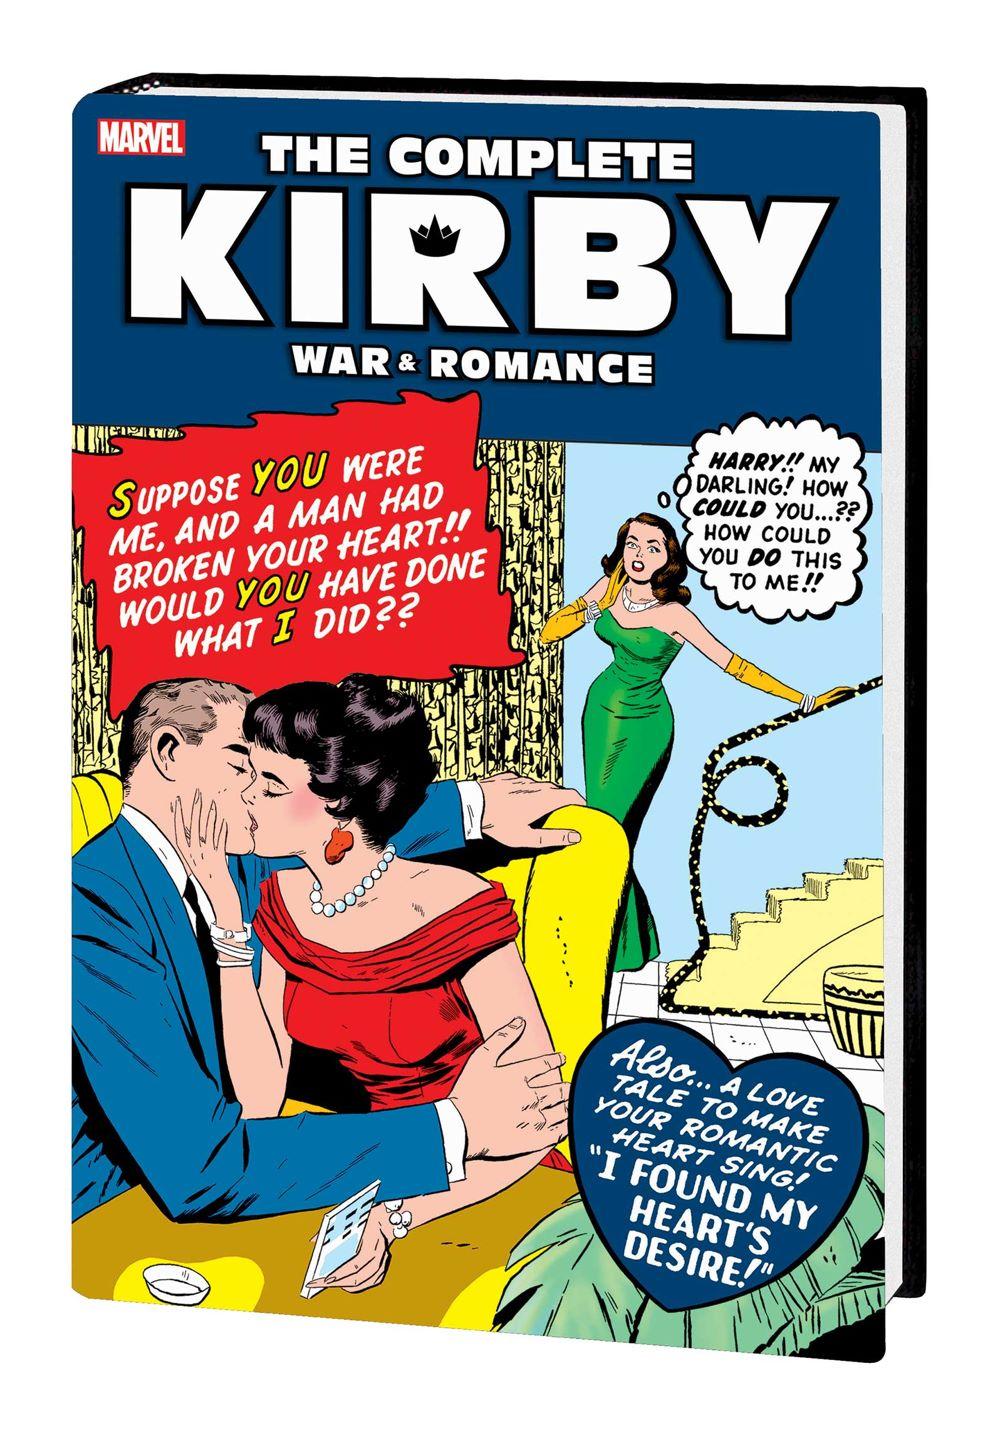 KIRBYLOVEWAR_OMNIBUS_HC_B Marvel Comics January 2021 Solicitations